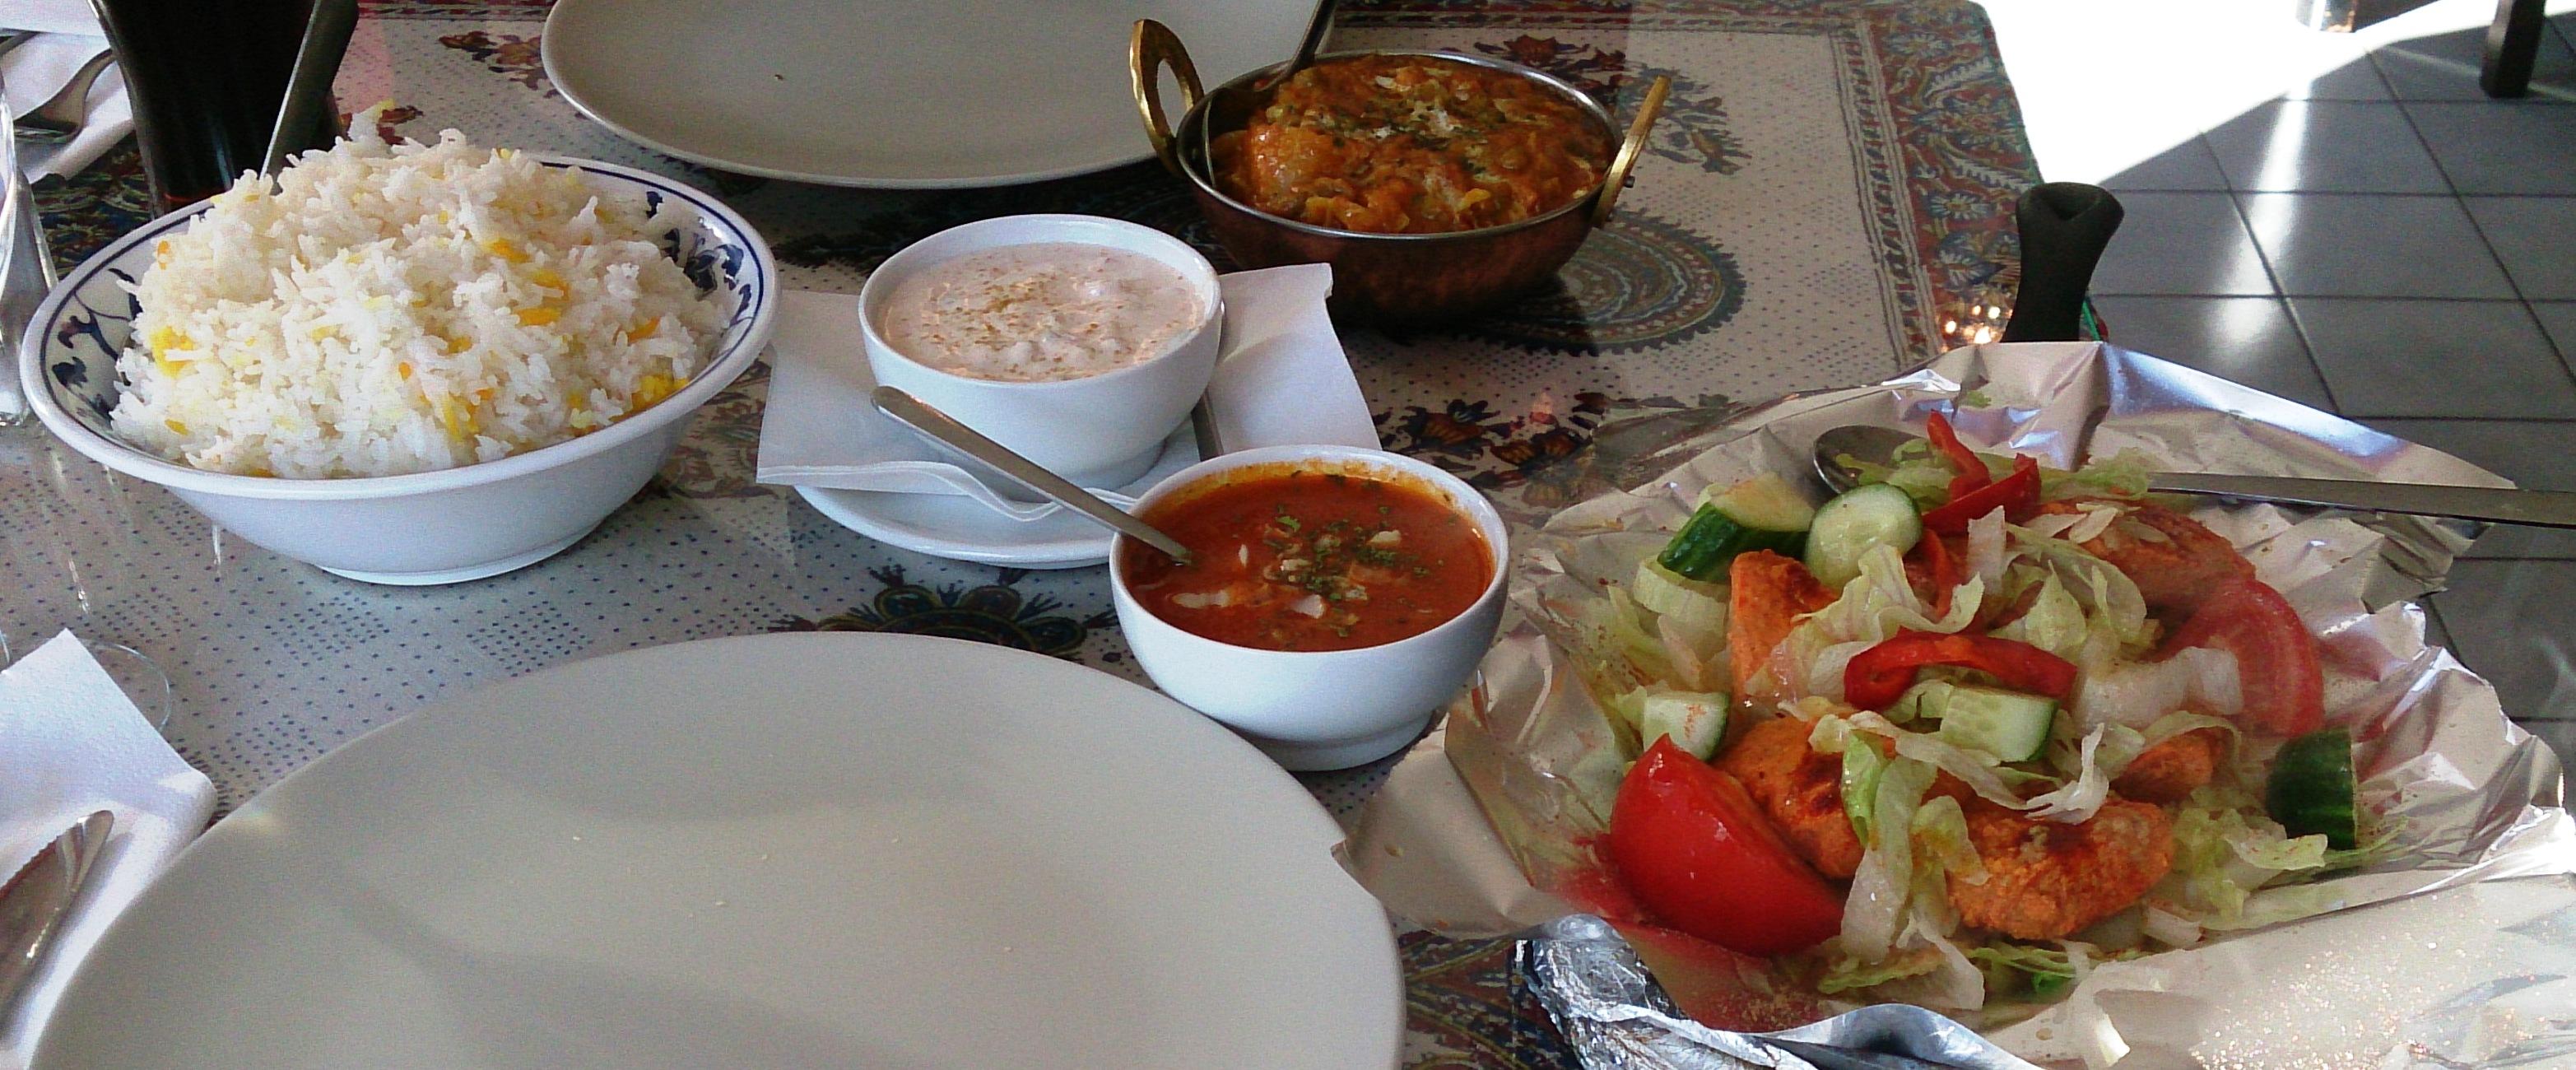 Rang Mahal Indian Restaurant, Rovaniemi